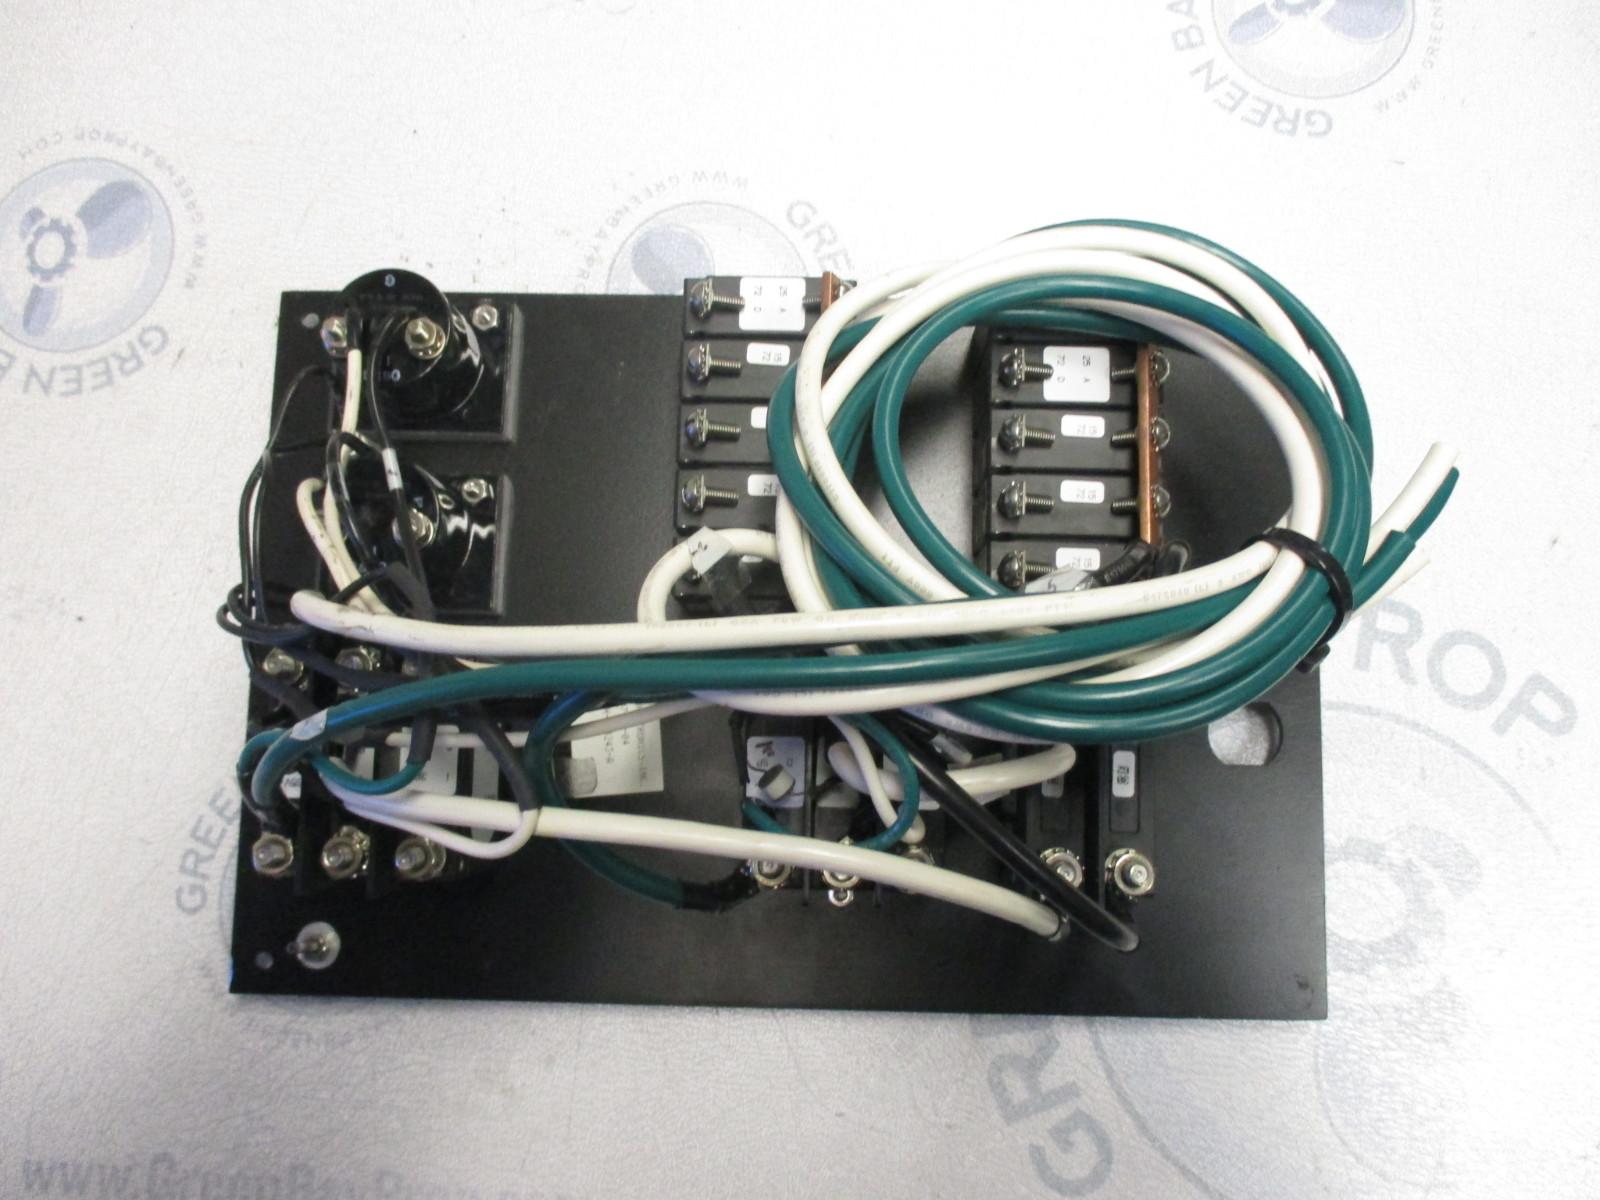 marine boat breaker panel main controls 120v 60hz ac system